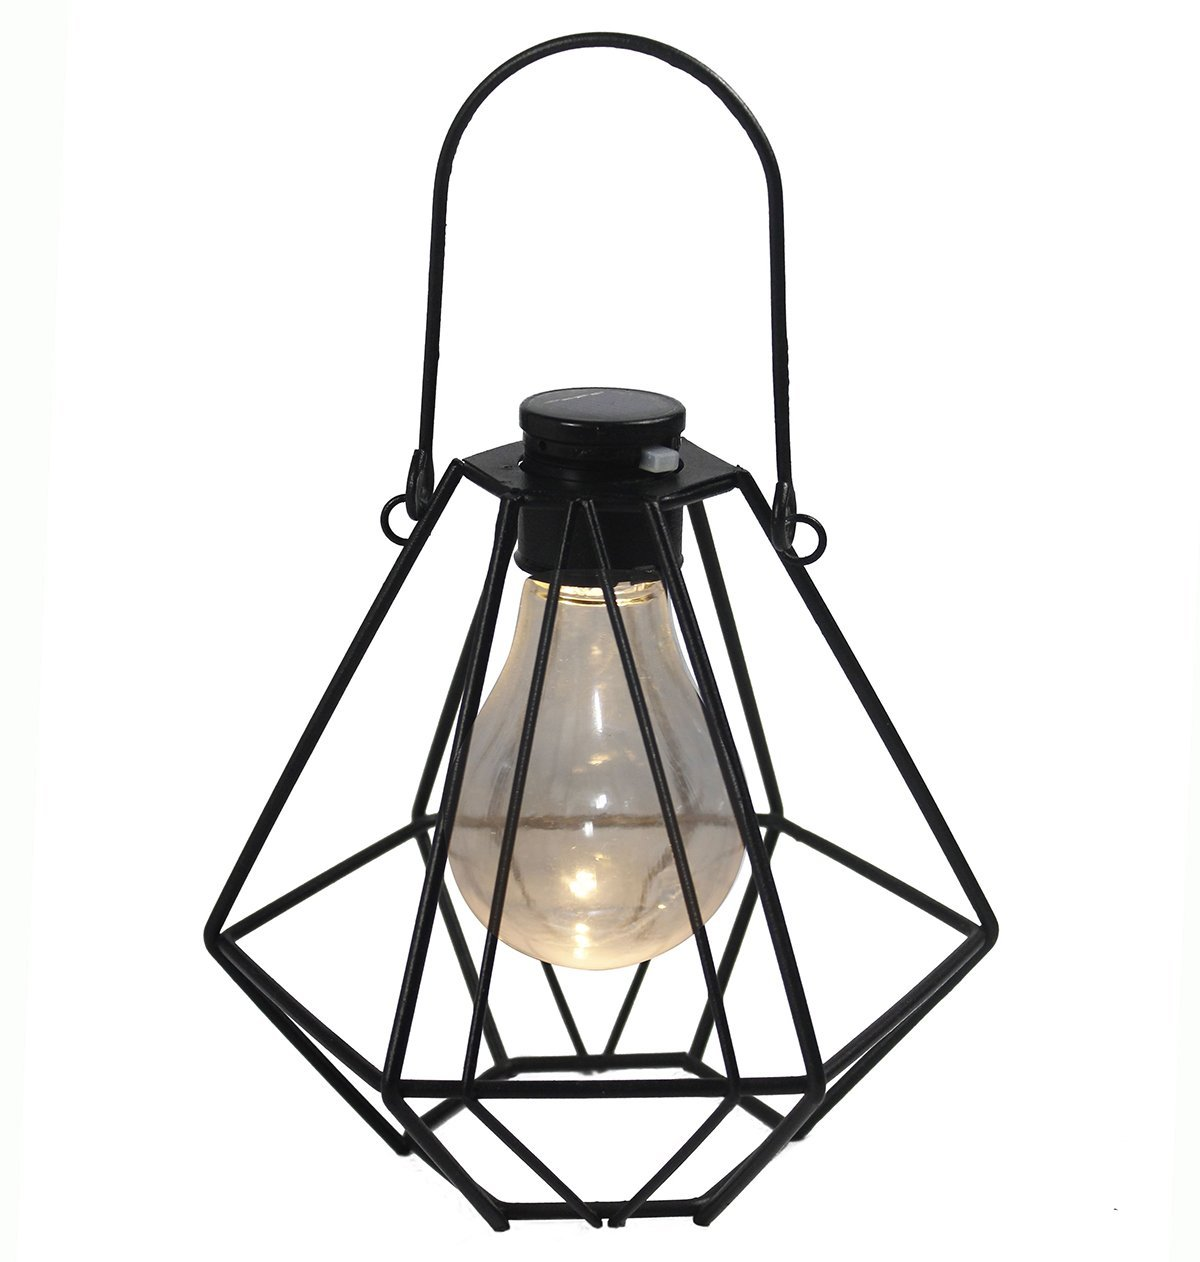 Obell Industrial Vintage Metal Diamond Shape Cage Lights- Warm Night Light- Hanging Solar Lights-Solar Table Lamp (Black)